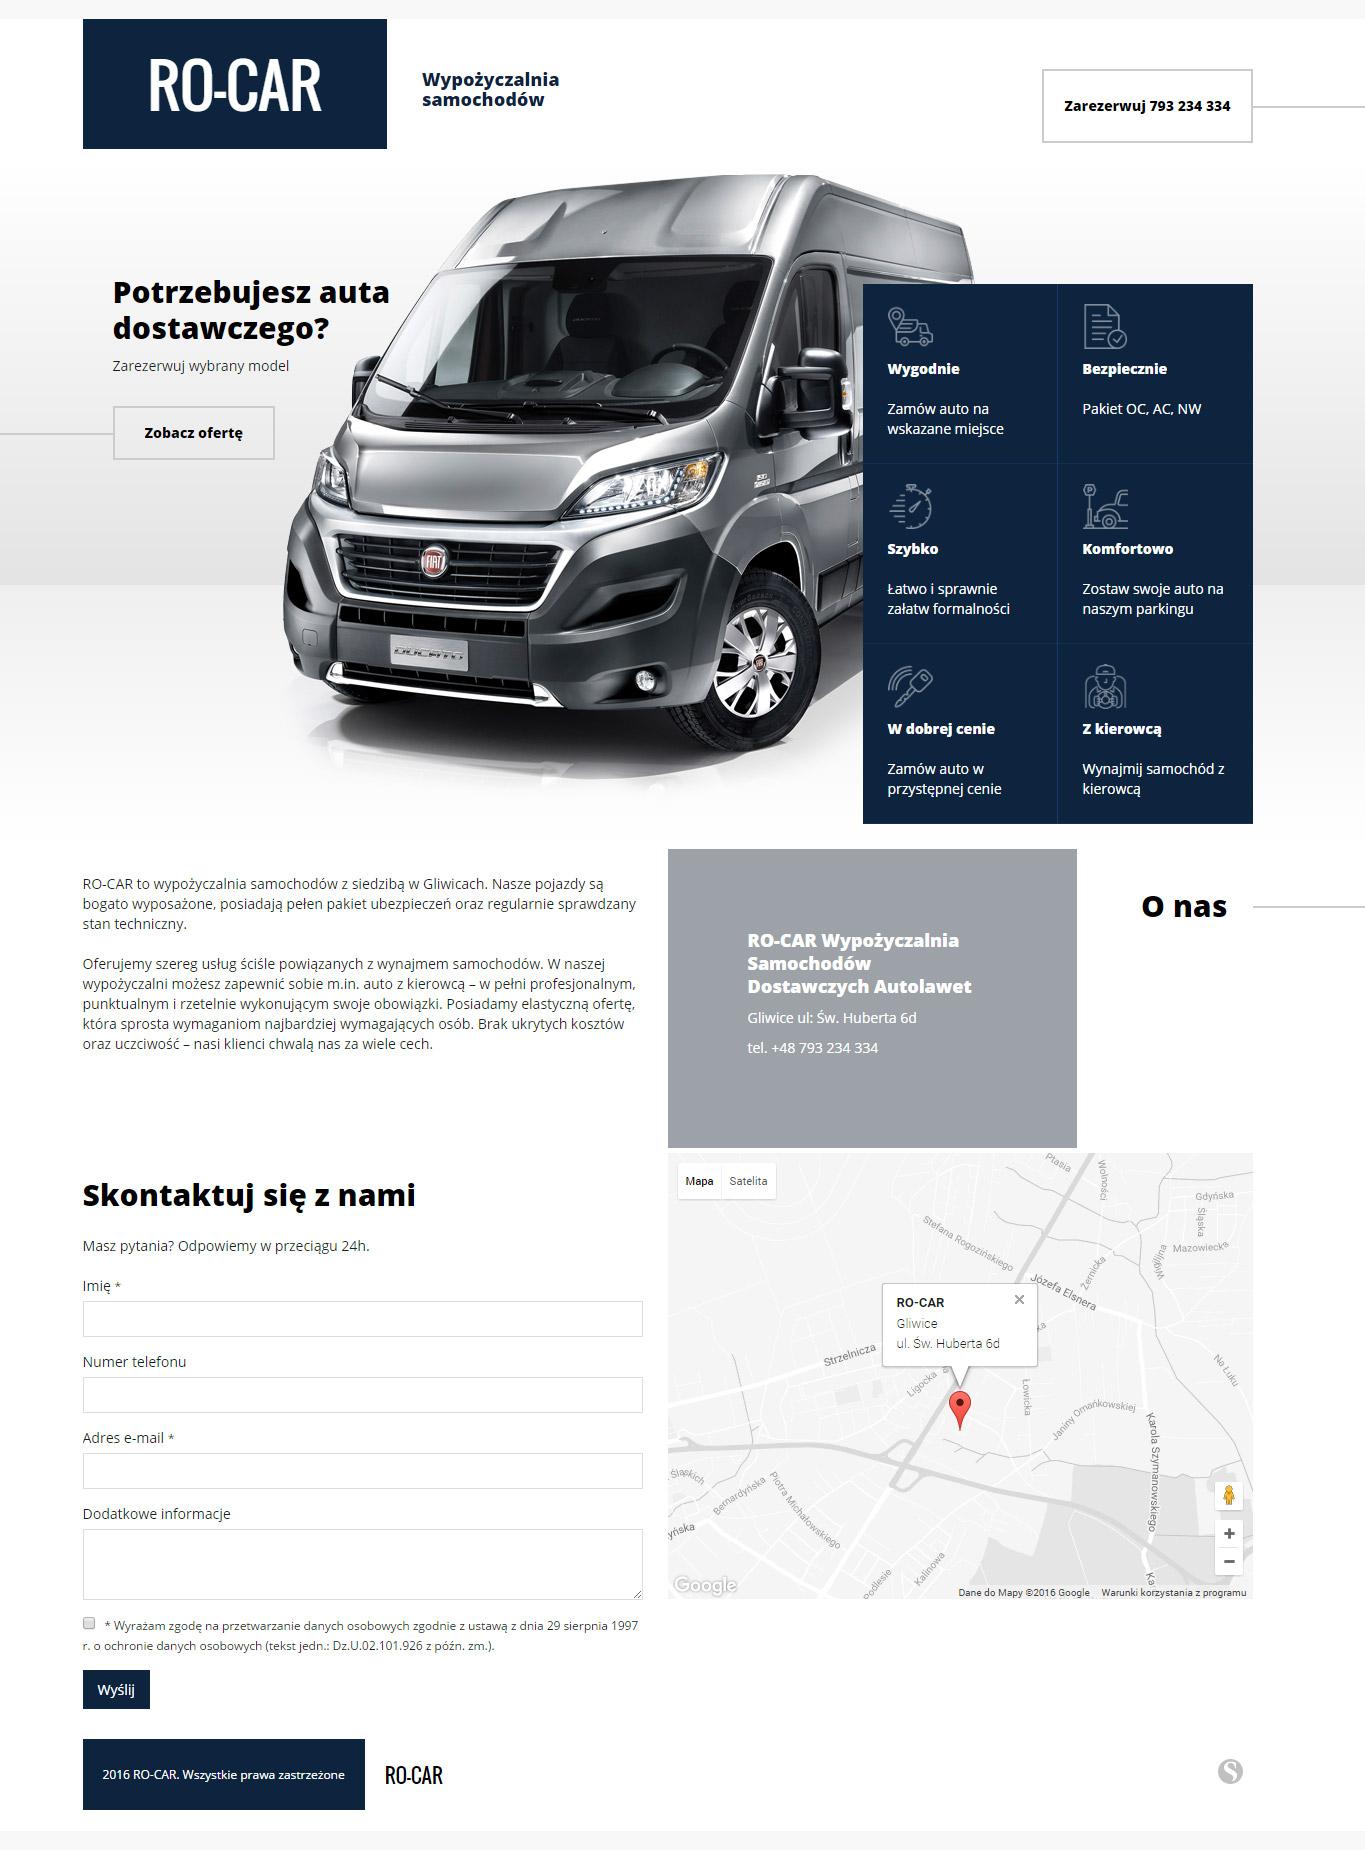 ro-car-strona-www.jpg